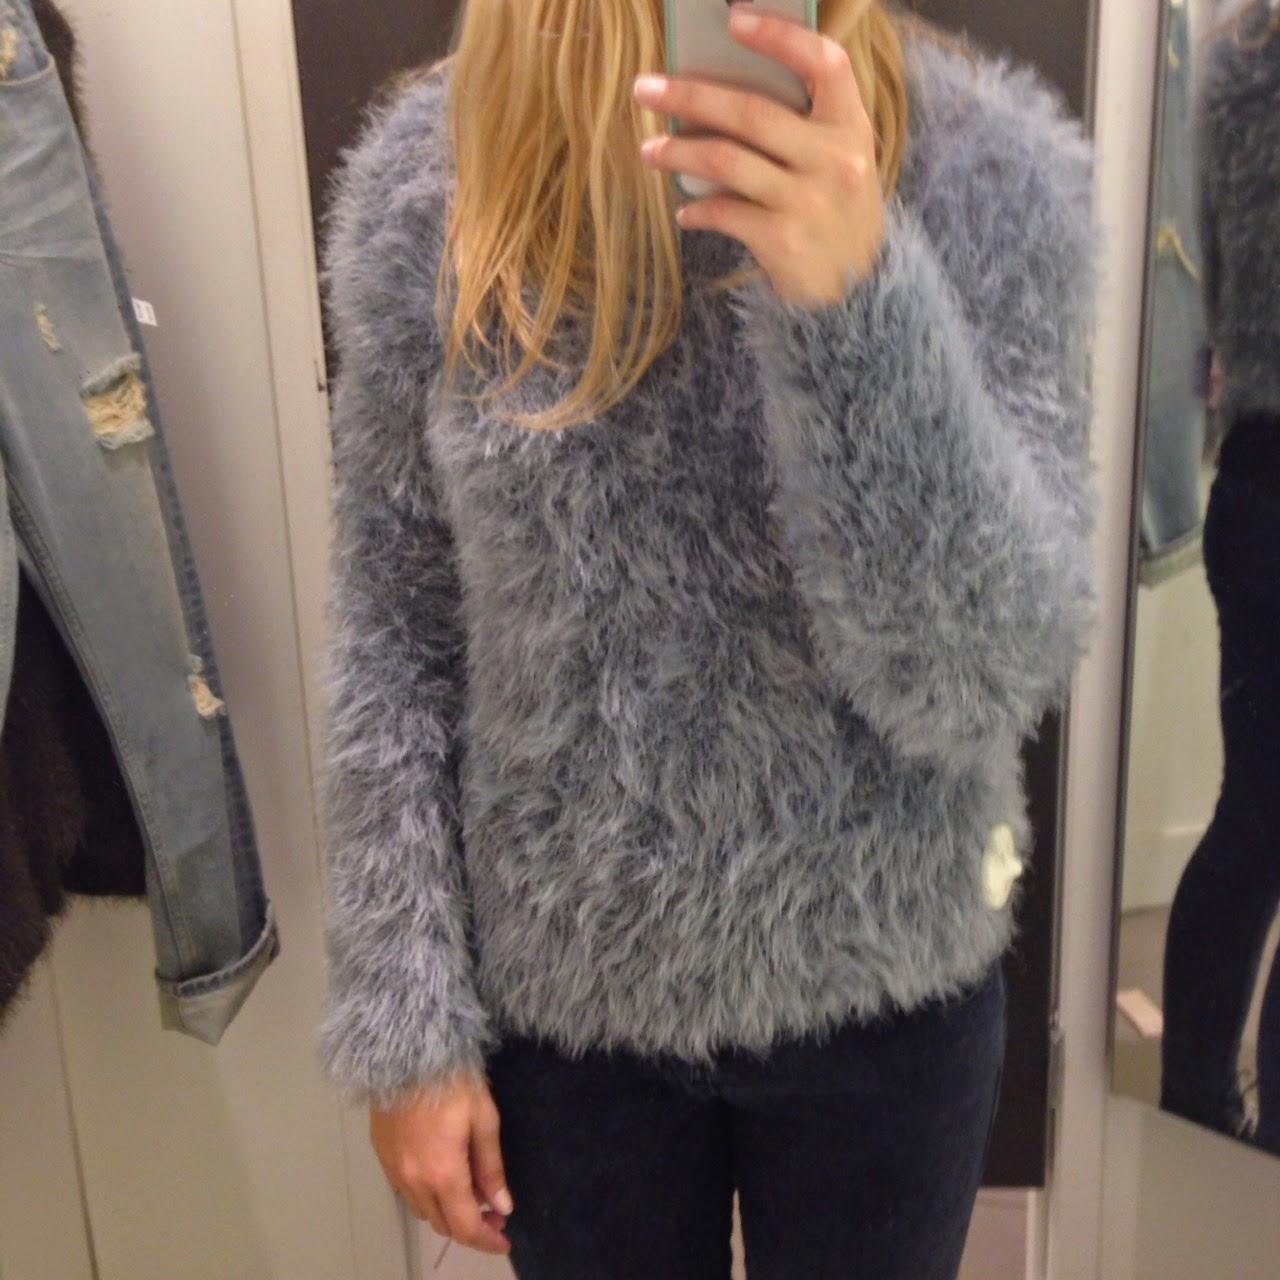 Zwarte Fluffy Trui.Winkelen Bij H M Zeeuws Meisje Lifestyleblog Over Zeeland